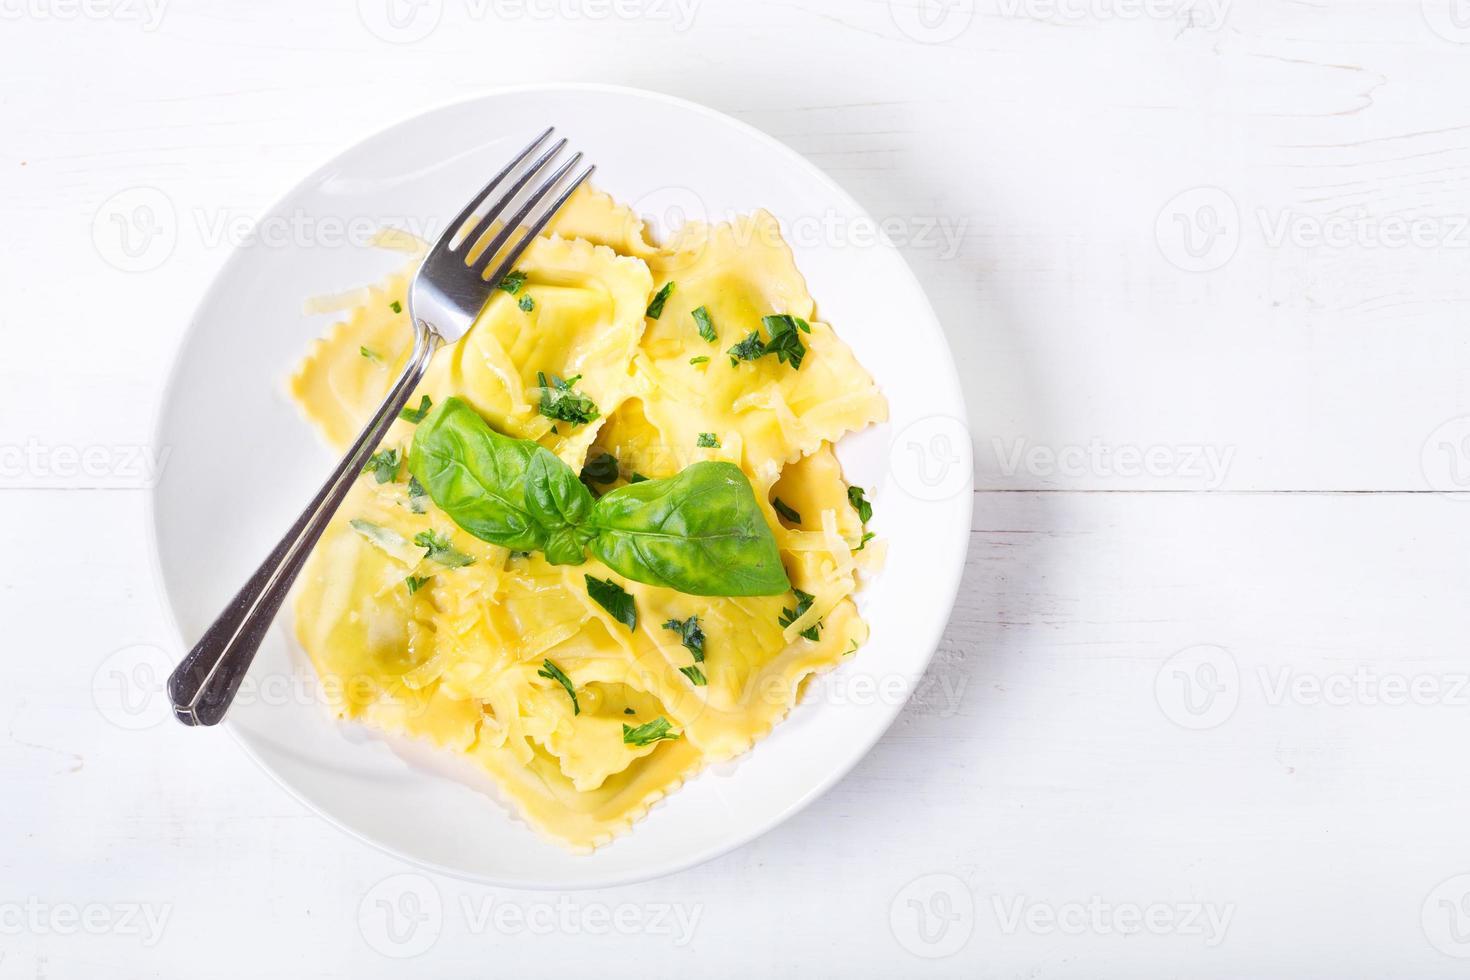 plate of ravioli with basil photo